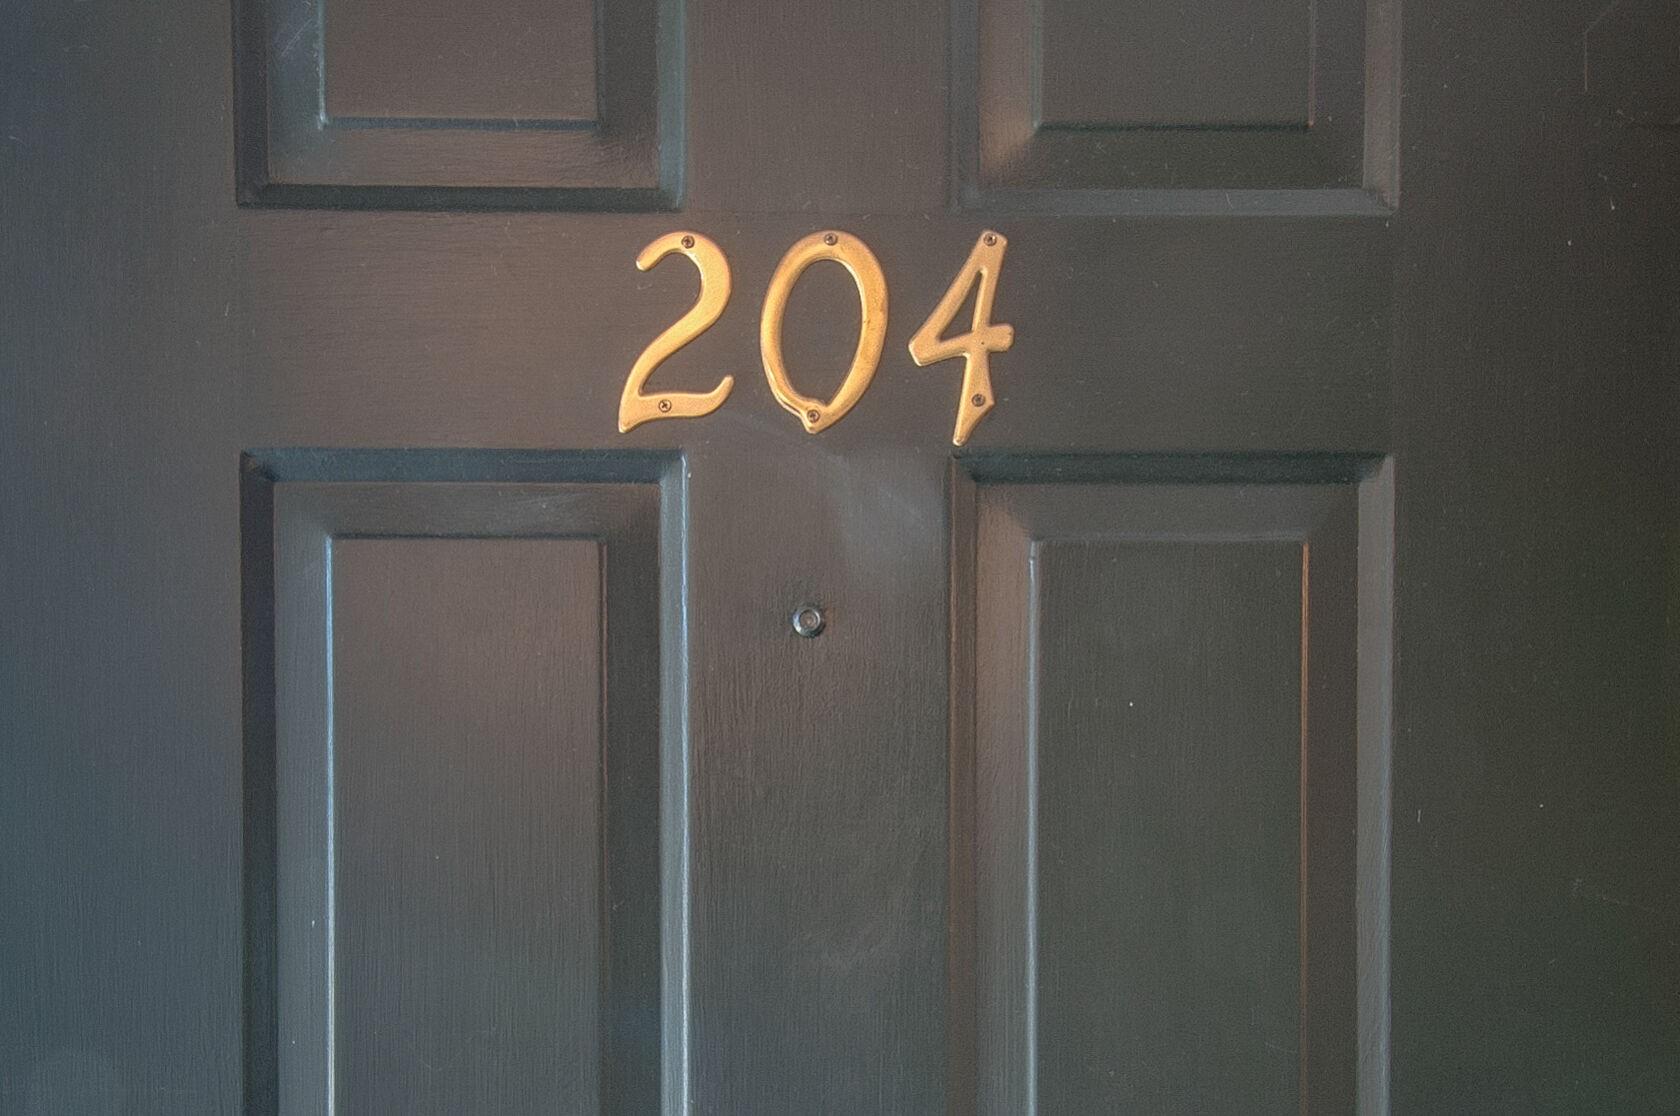 4202 Harding Pike 204